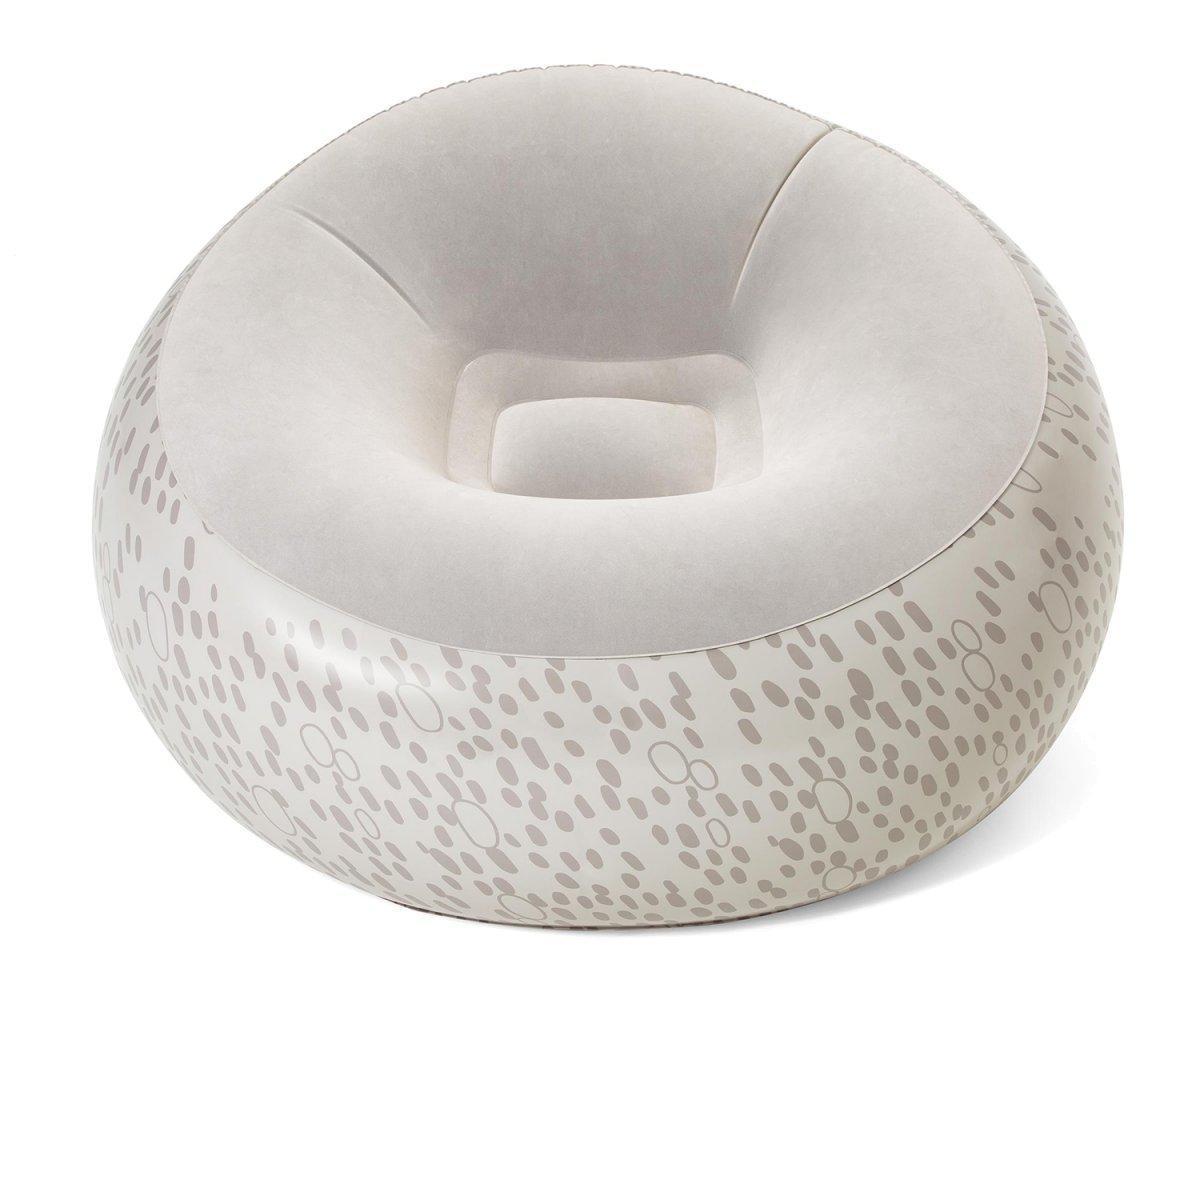 Надувное кресло Bestway 75052, 112 х 112 х 66 см, белое